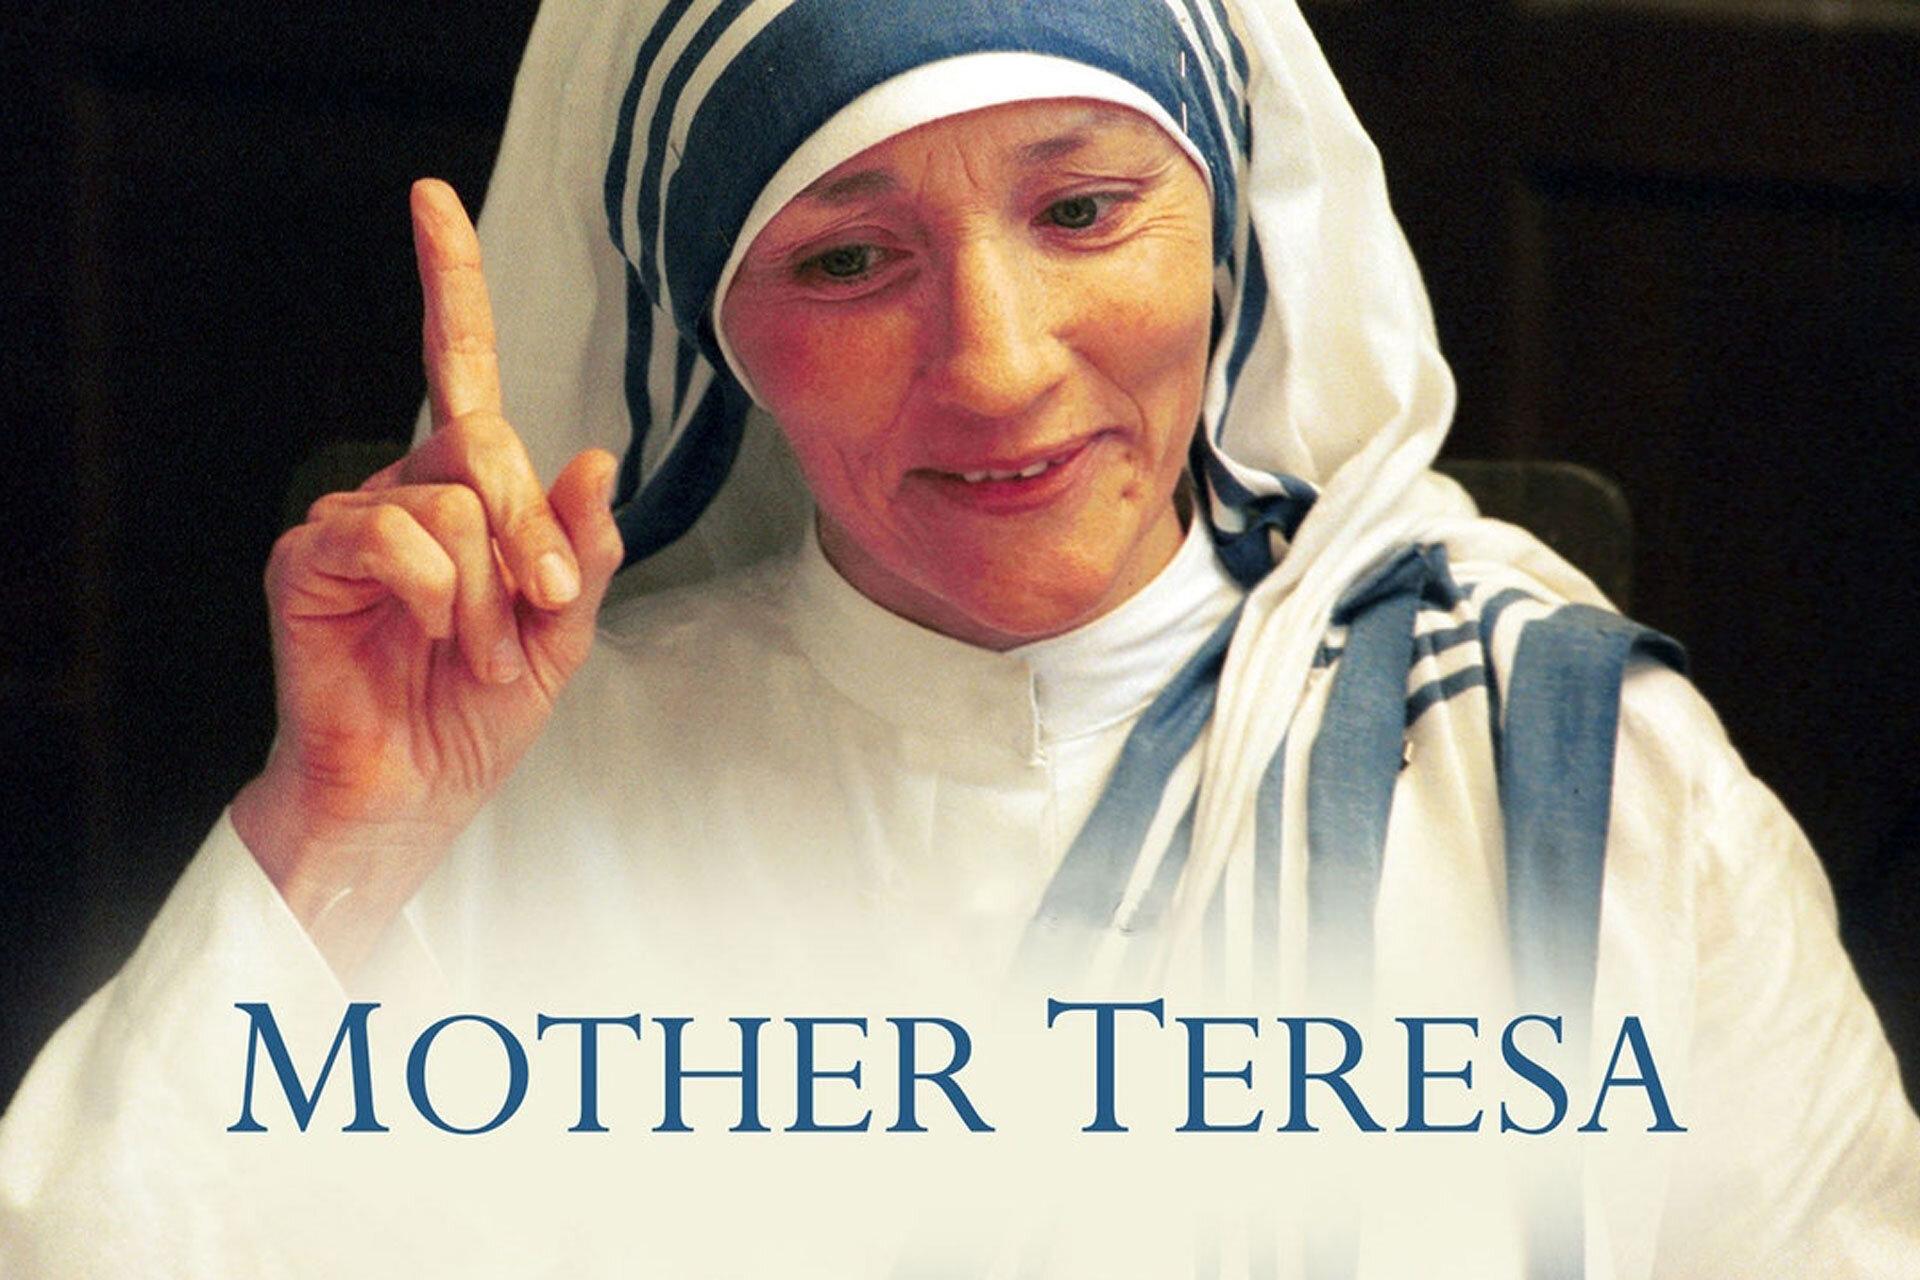 mother-teresa-movie-event-thumb.jpg